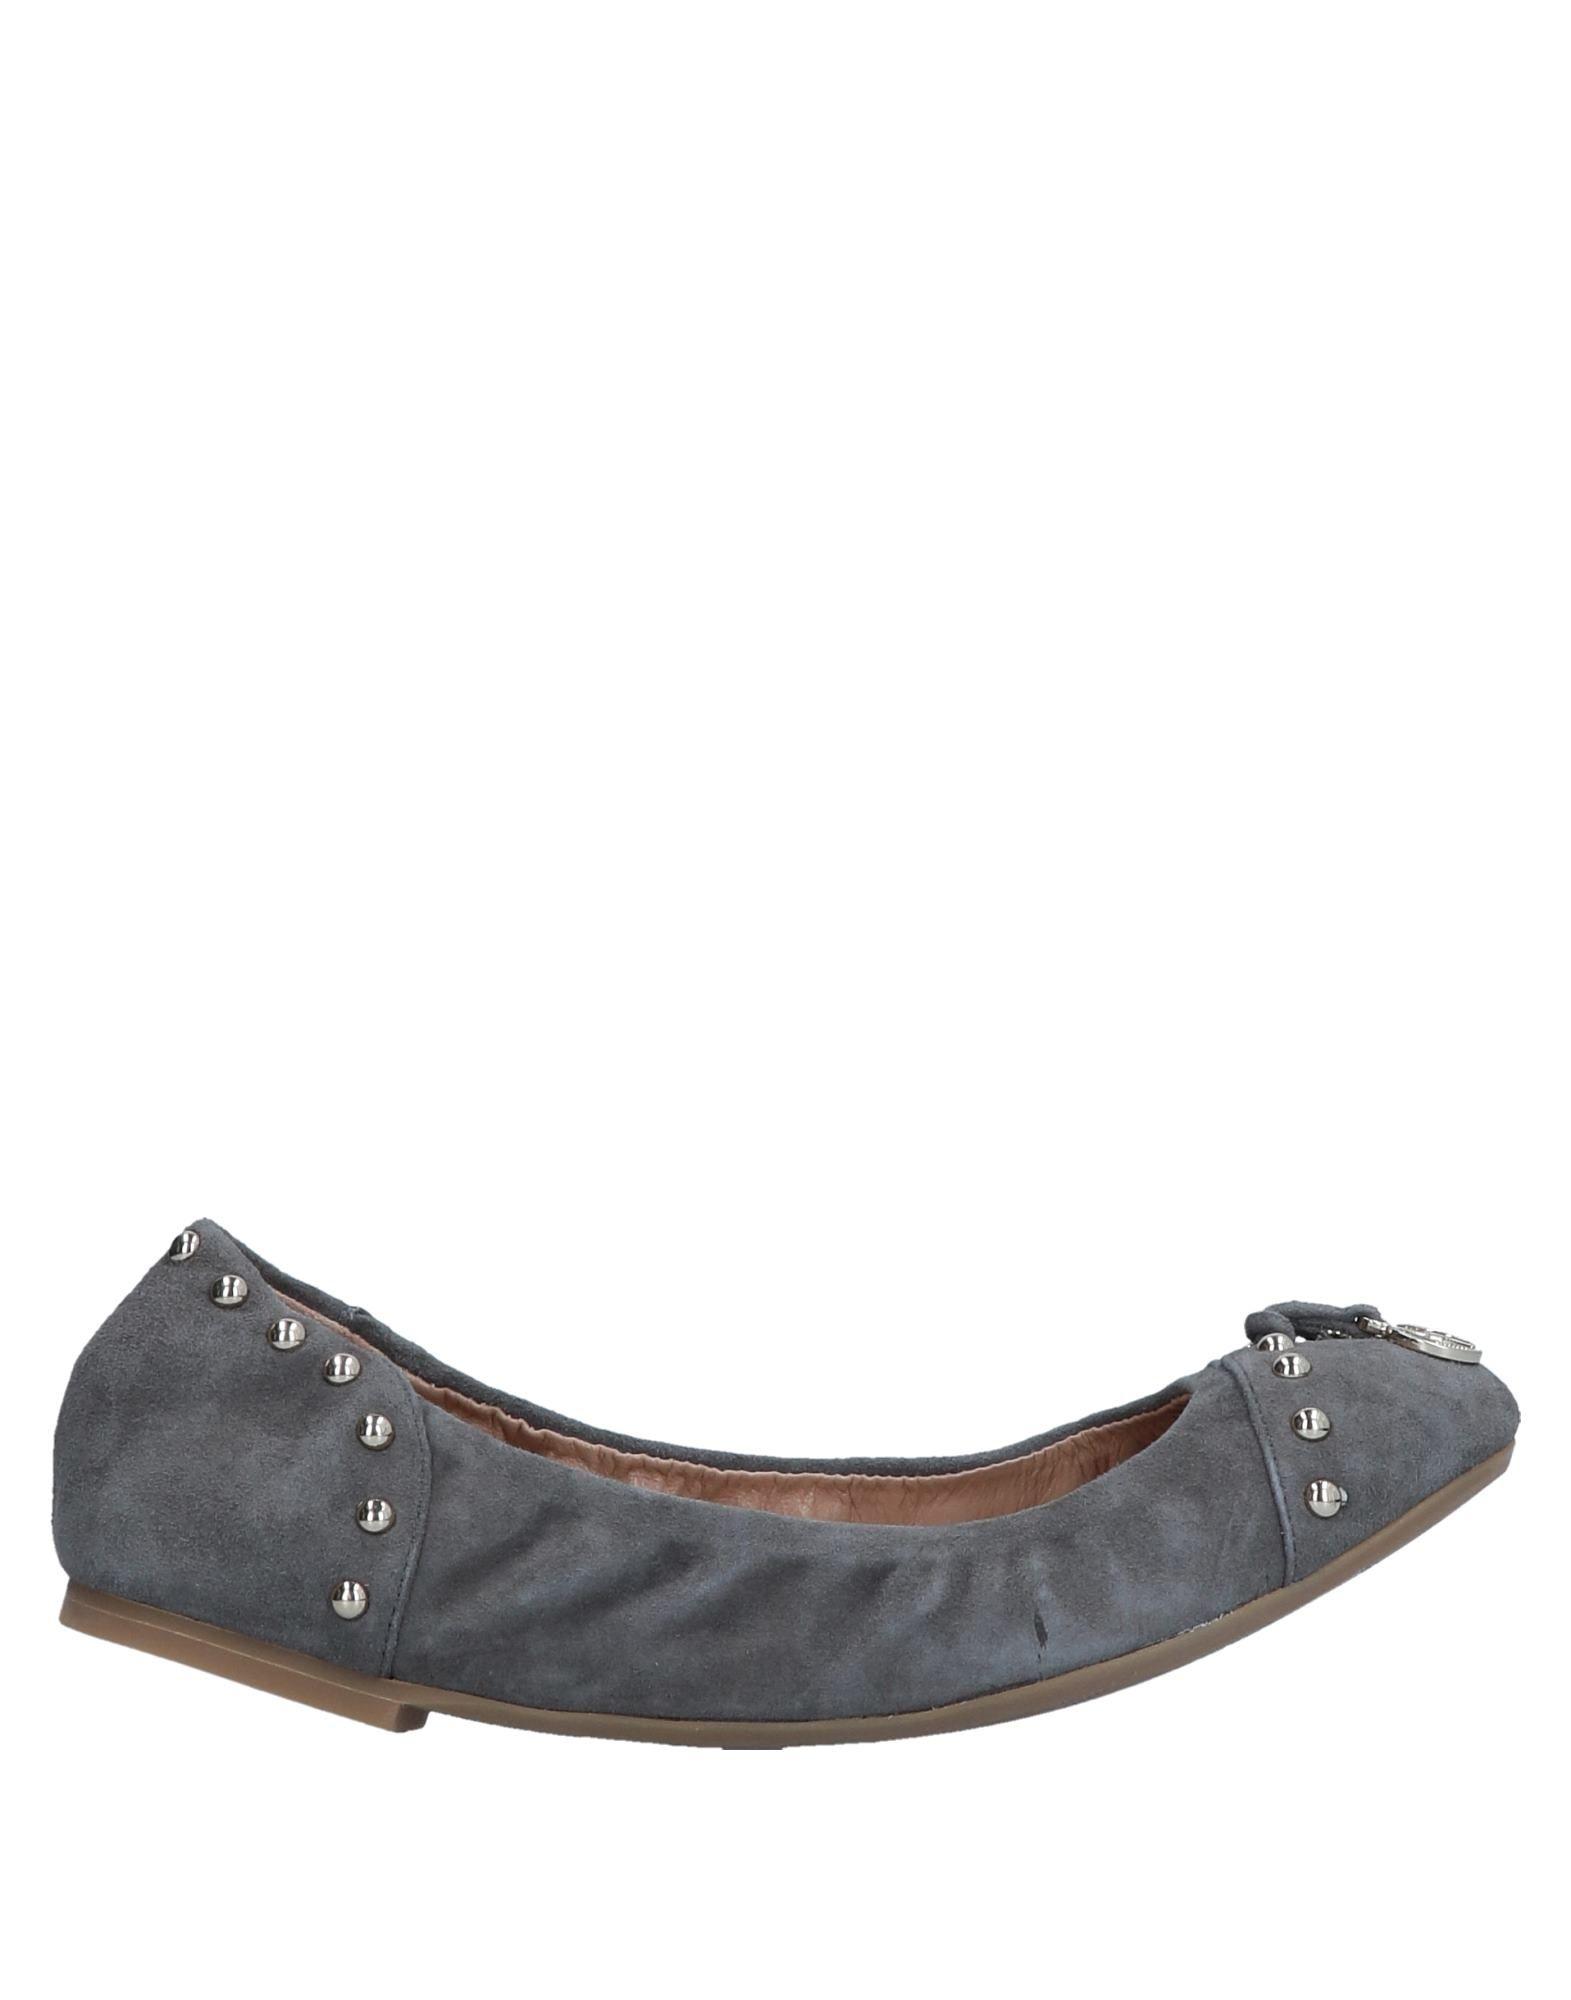 Armani Jeans Ballet Flats - Women Armani Jeans Ballet Flats - online on  Australia - Flats 11210512AL b6689f